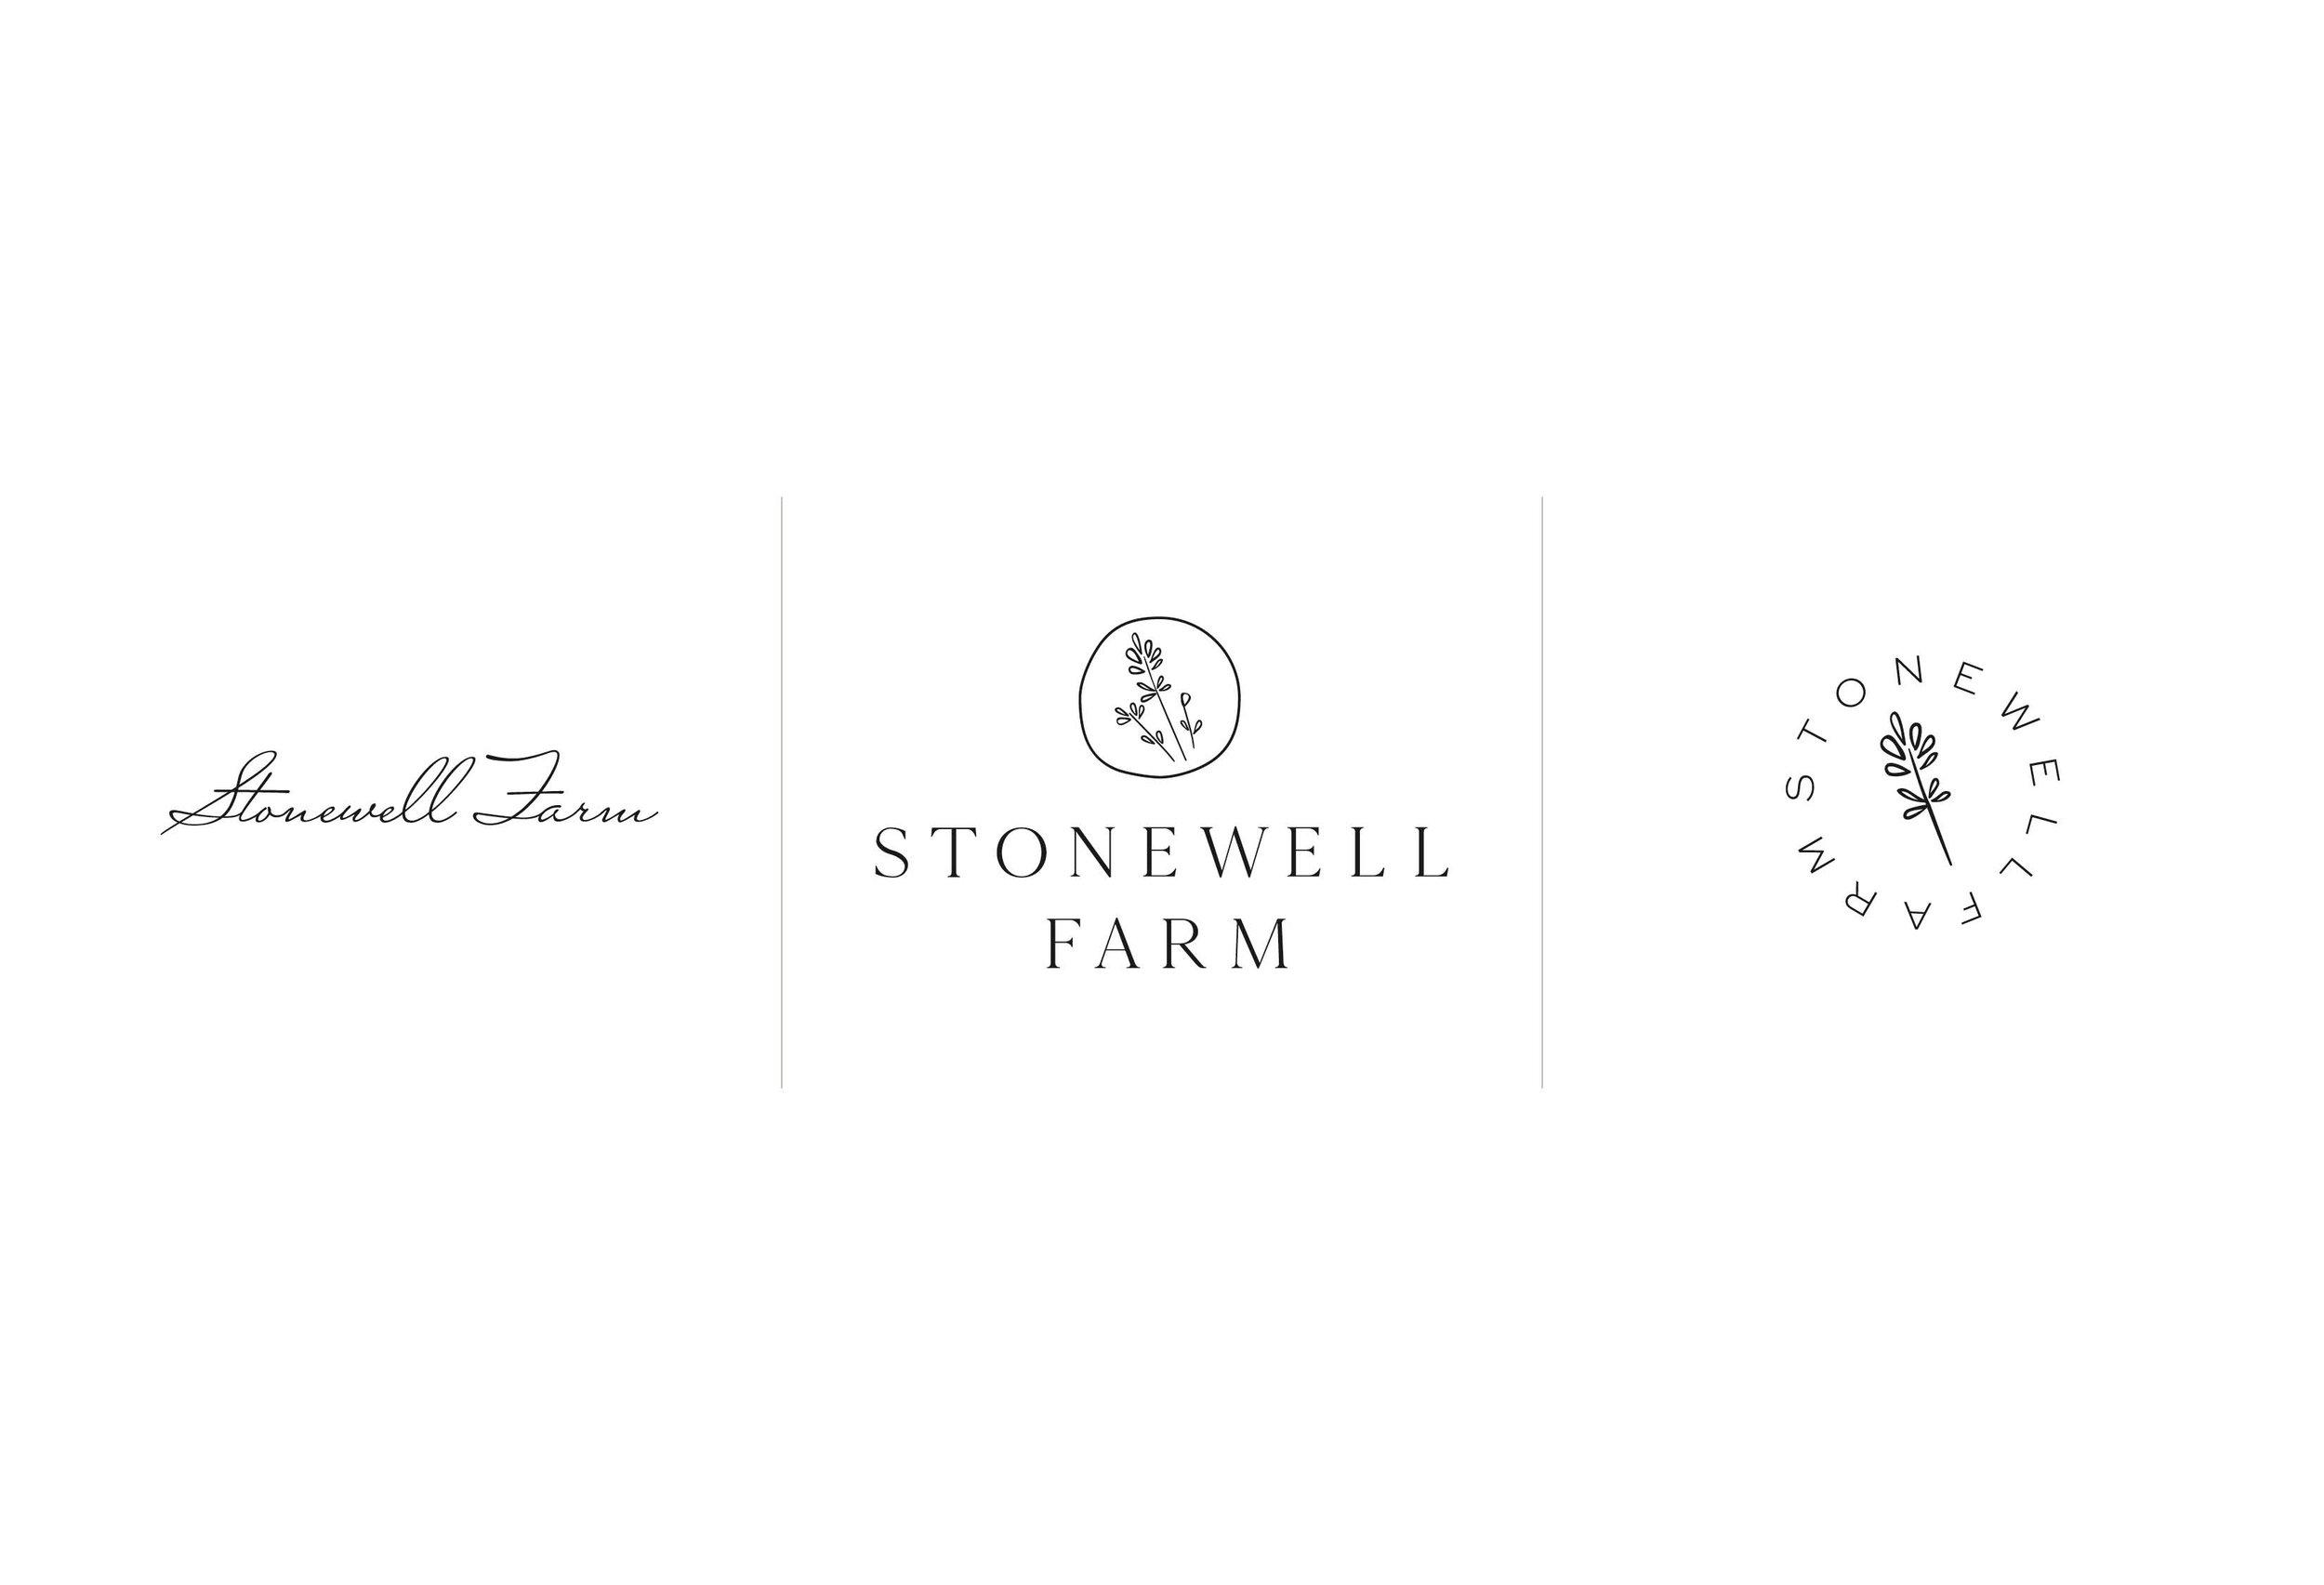 Stonewell Farm6.jpg